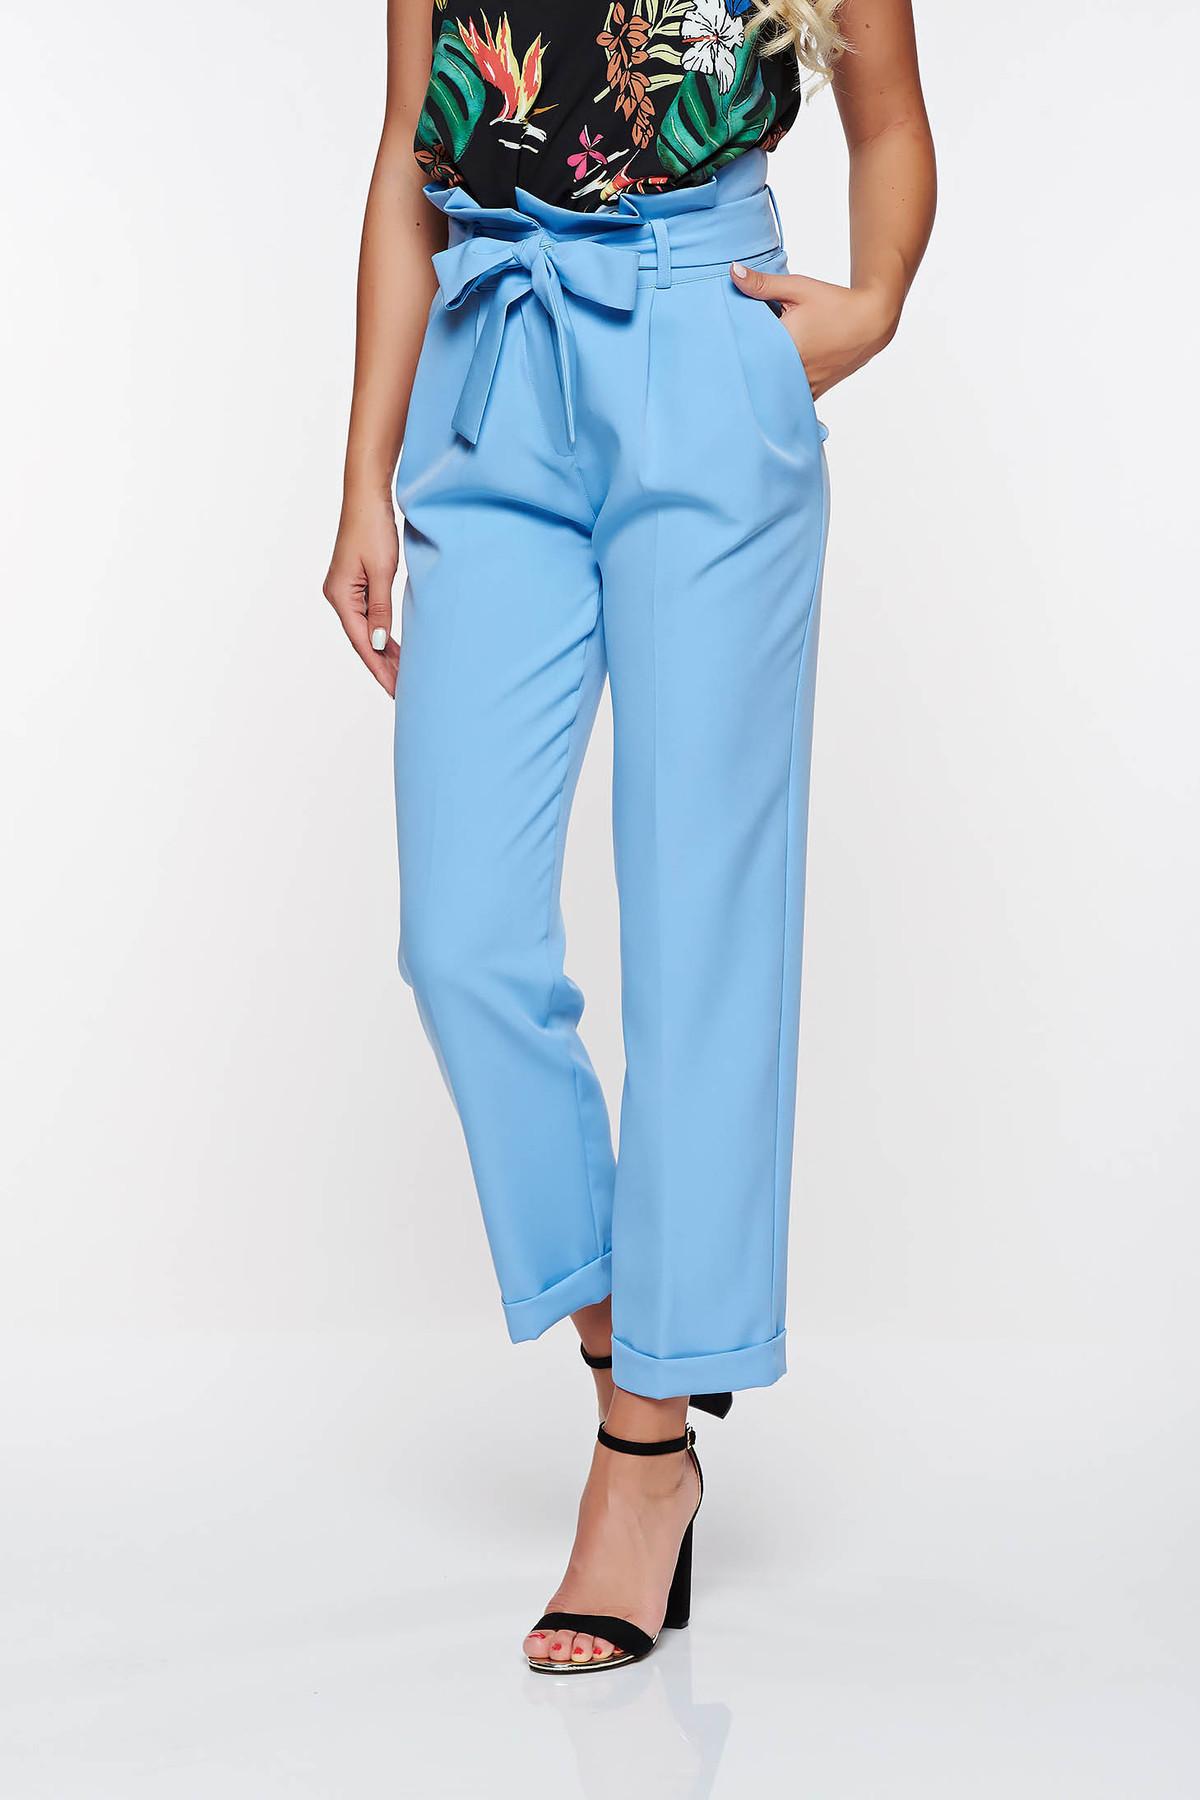 Pantaloni PrettyGirl albastri deschis office cu talie inalta din stofa usor elastica cu buzunare